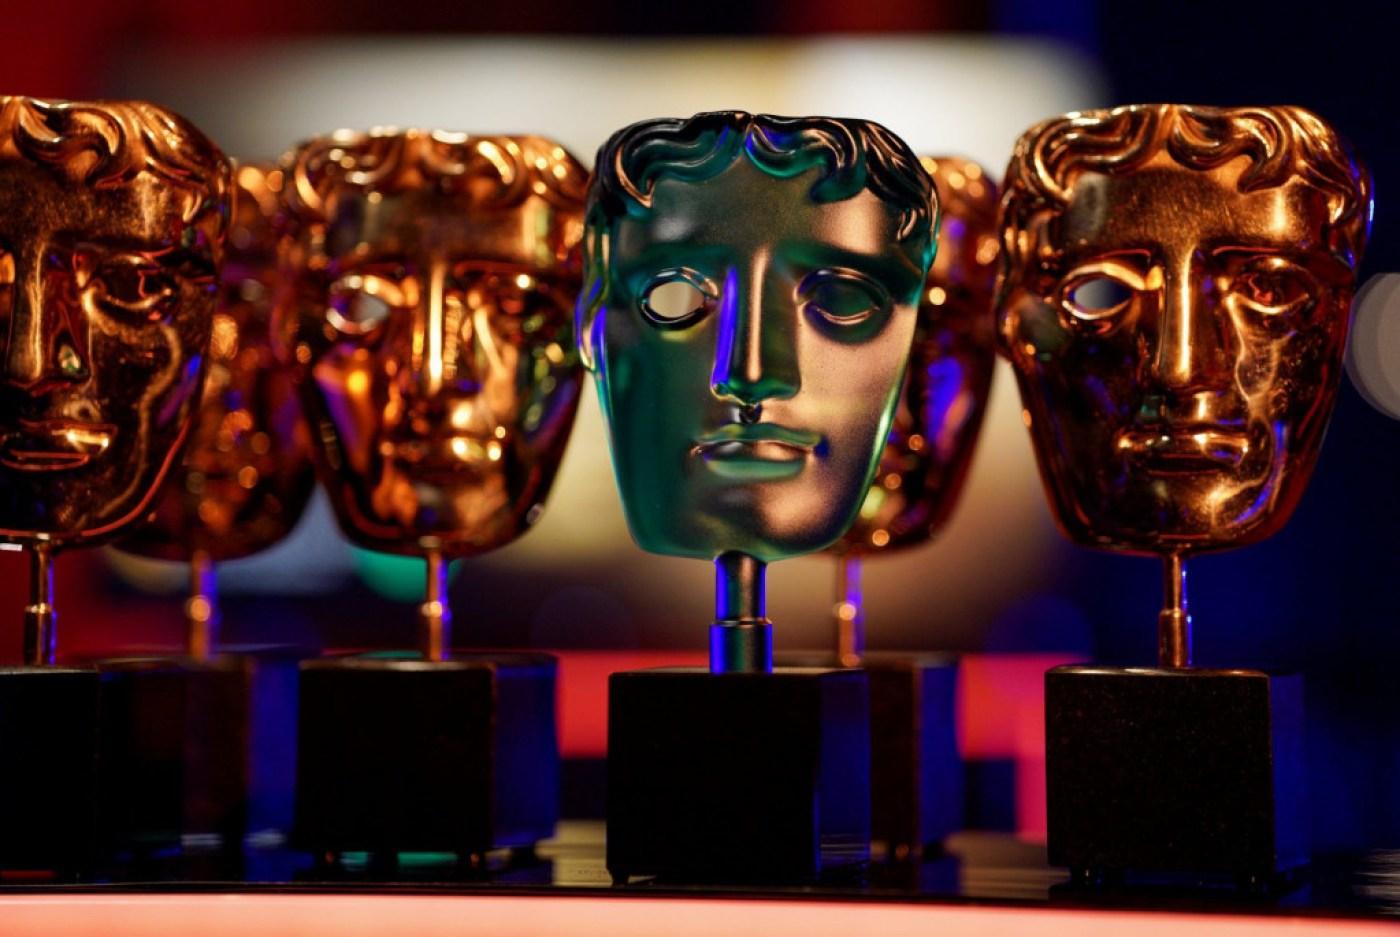 BAFTA TV Awards 2021 winners announced | 2021కి బాఫ్టా టీవీ అవార్డులను ప్రకటించింది. |_40.1